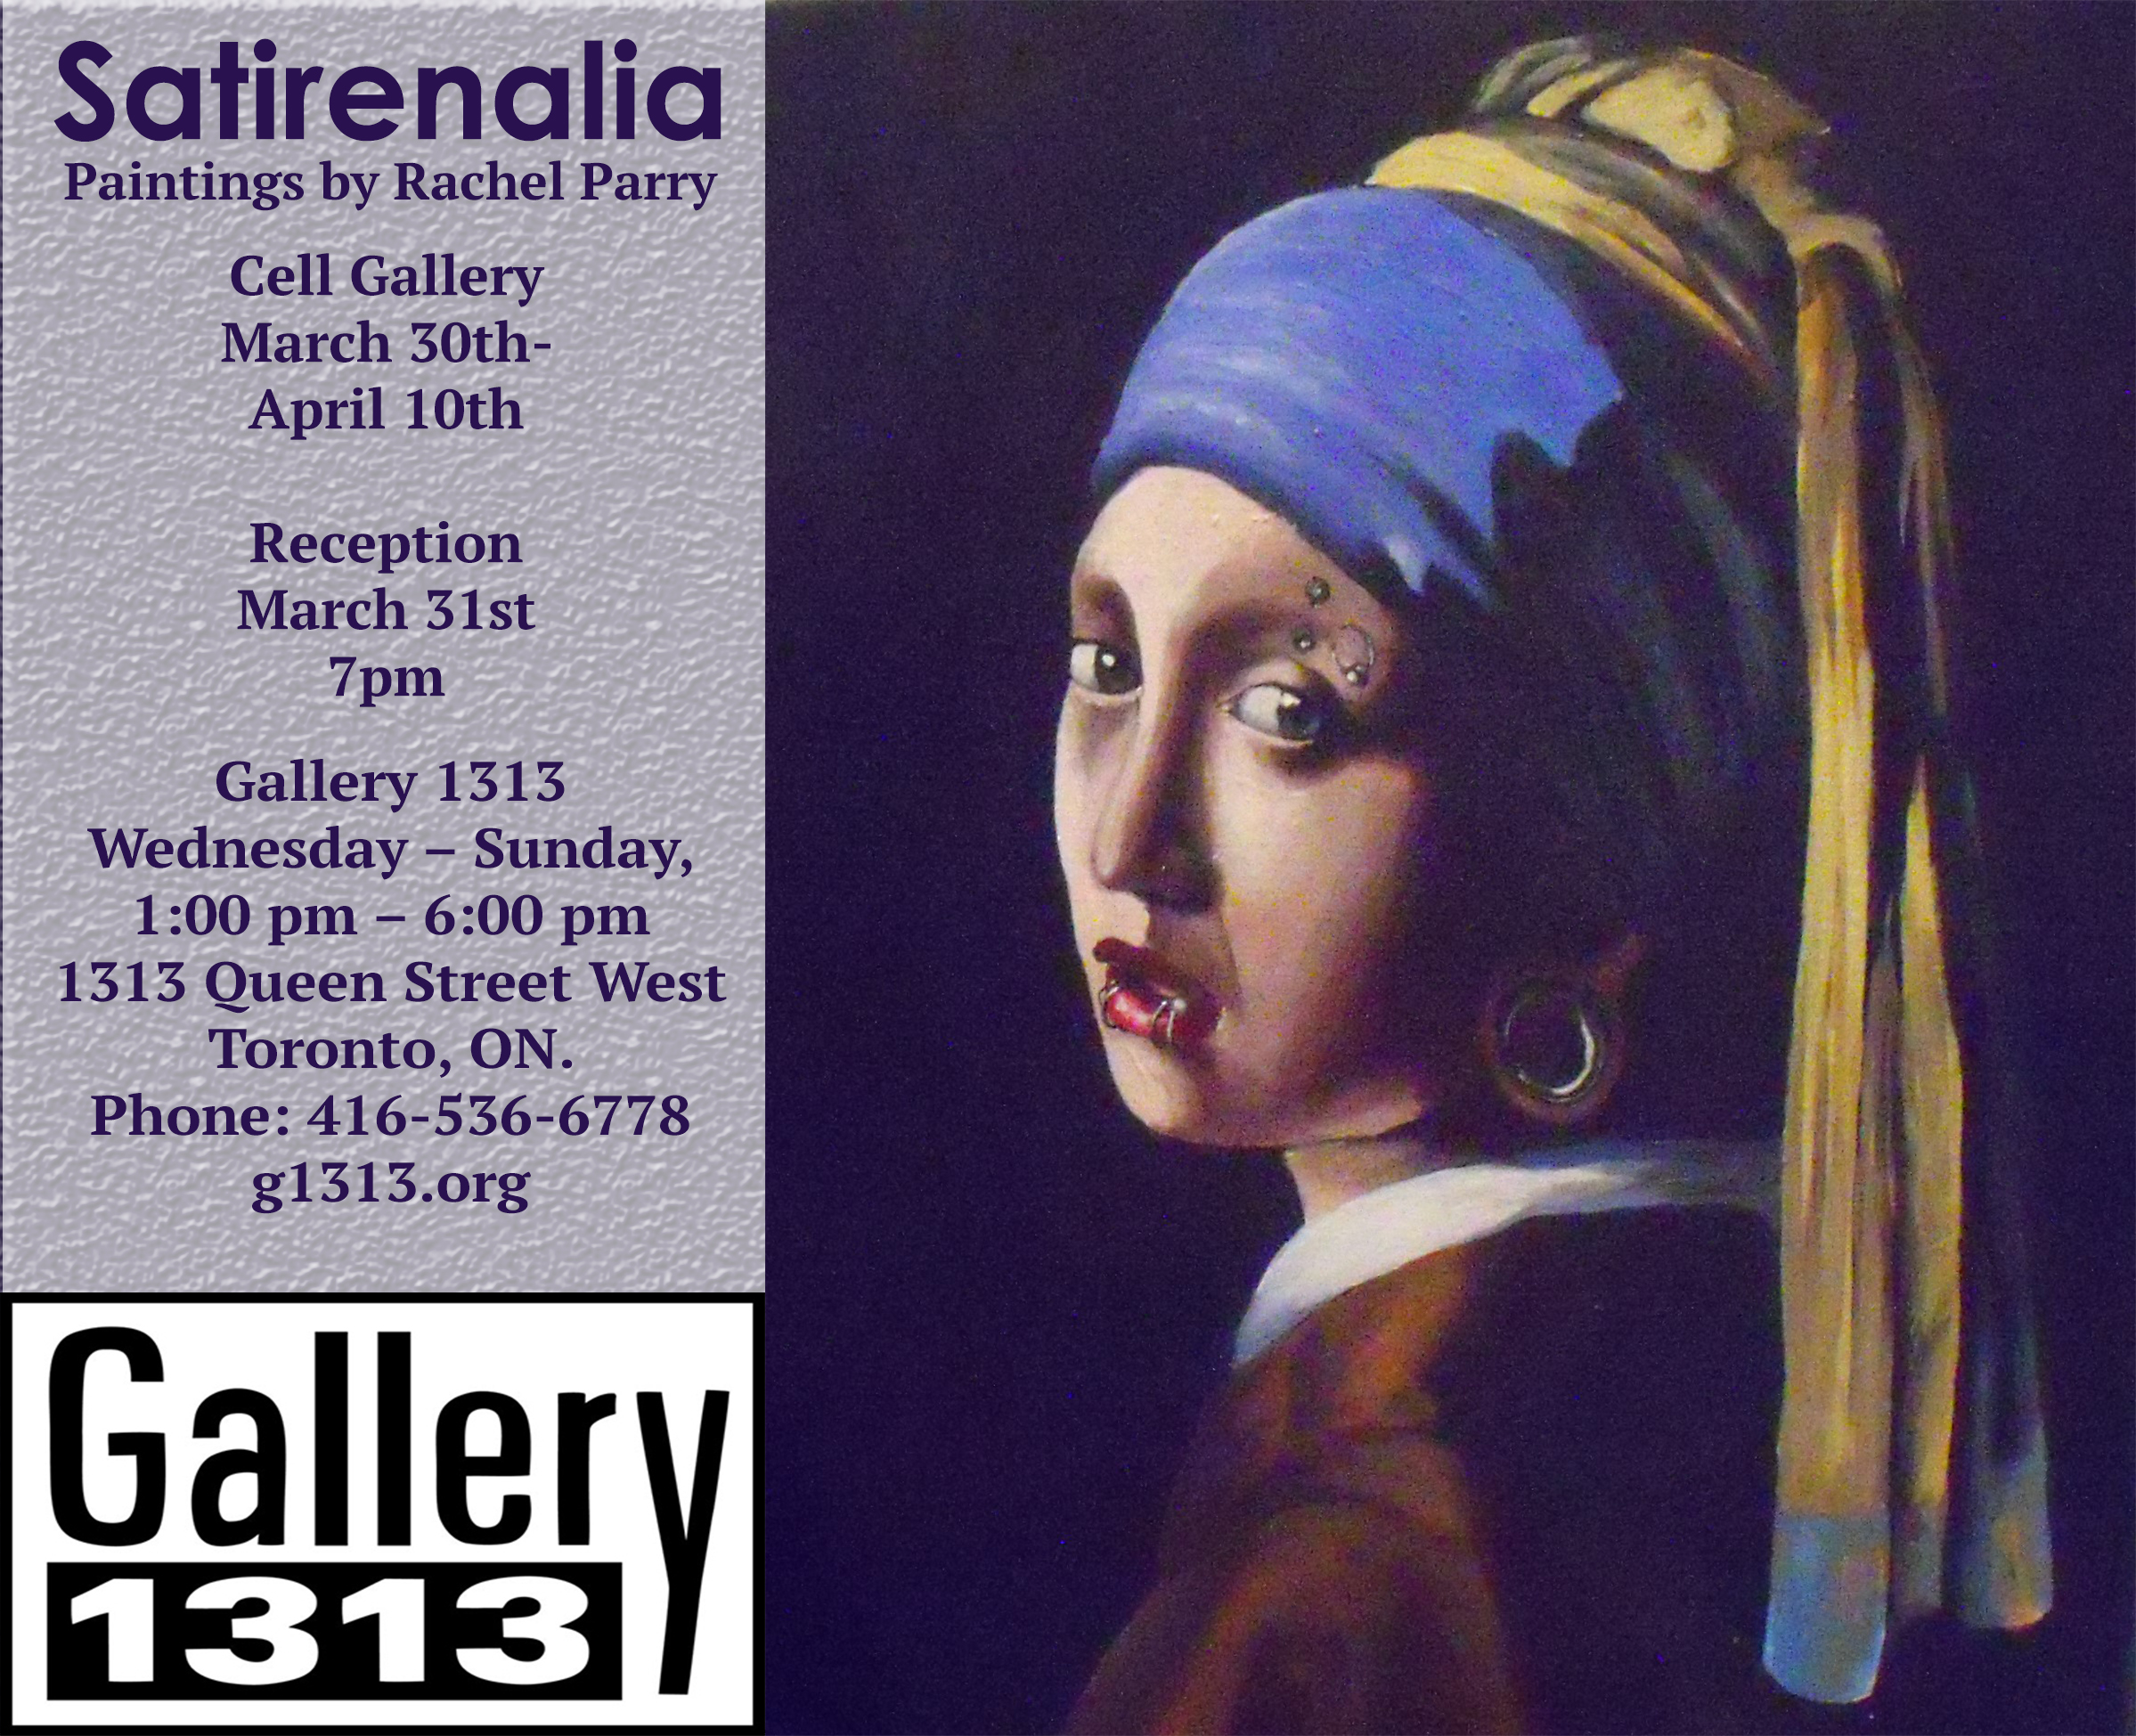 Satirenalia Exhibition Poster